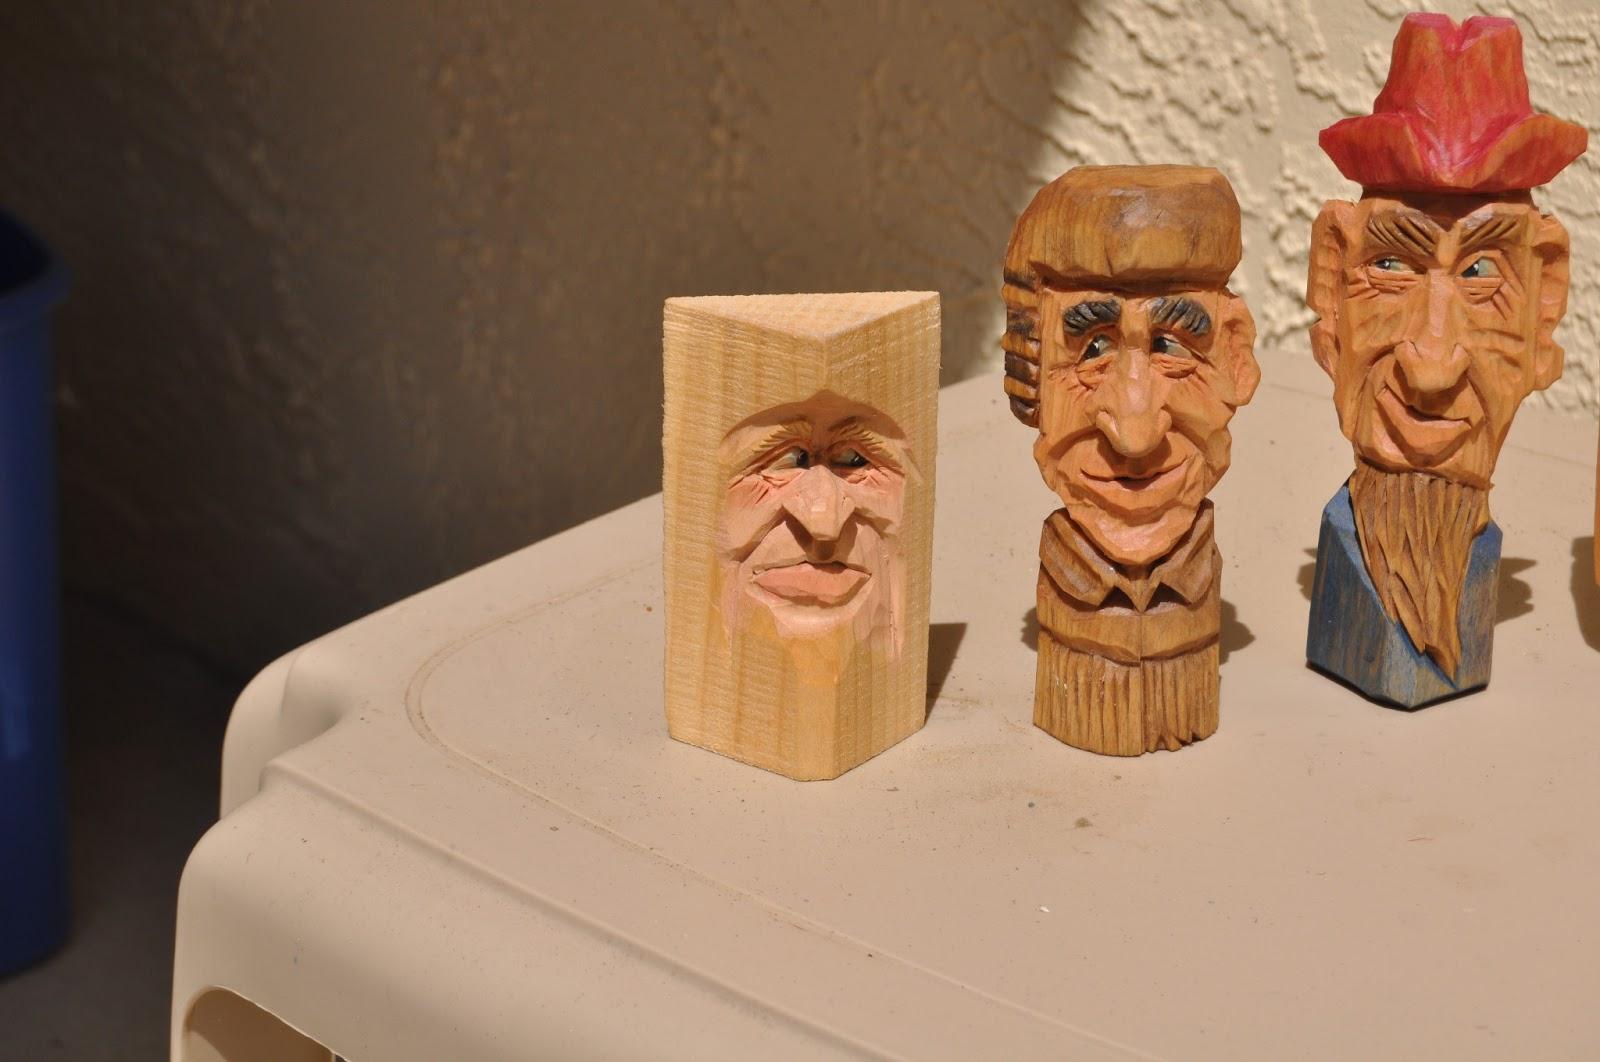 Niagara woodchipper